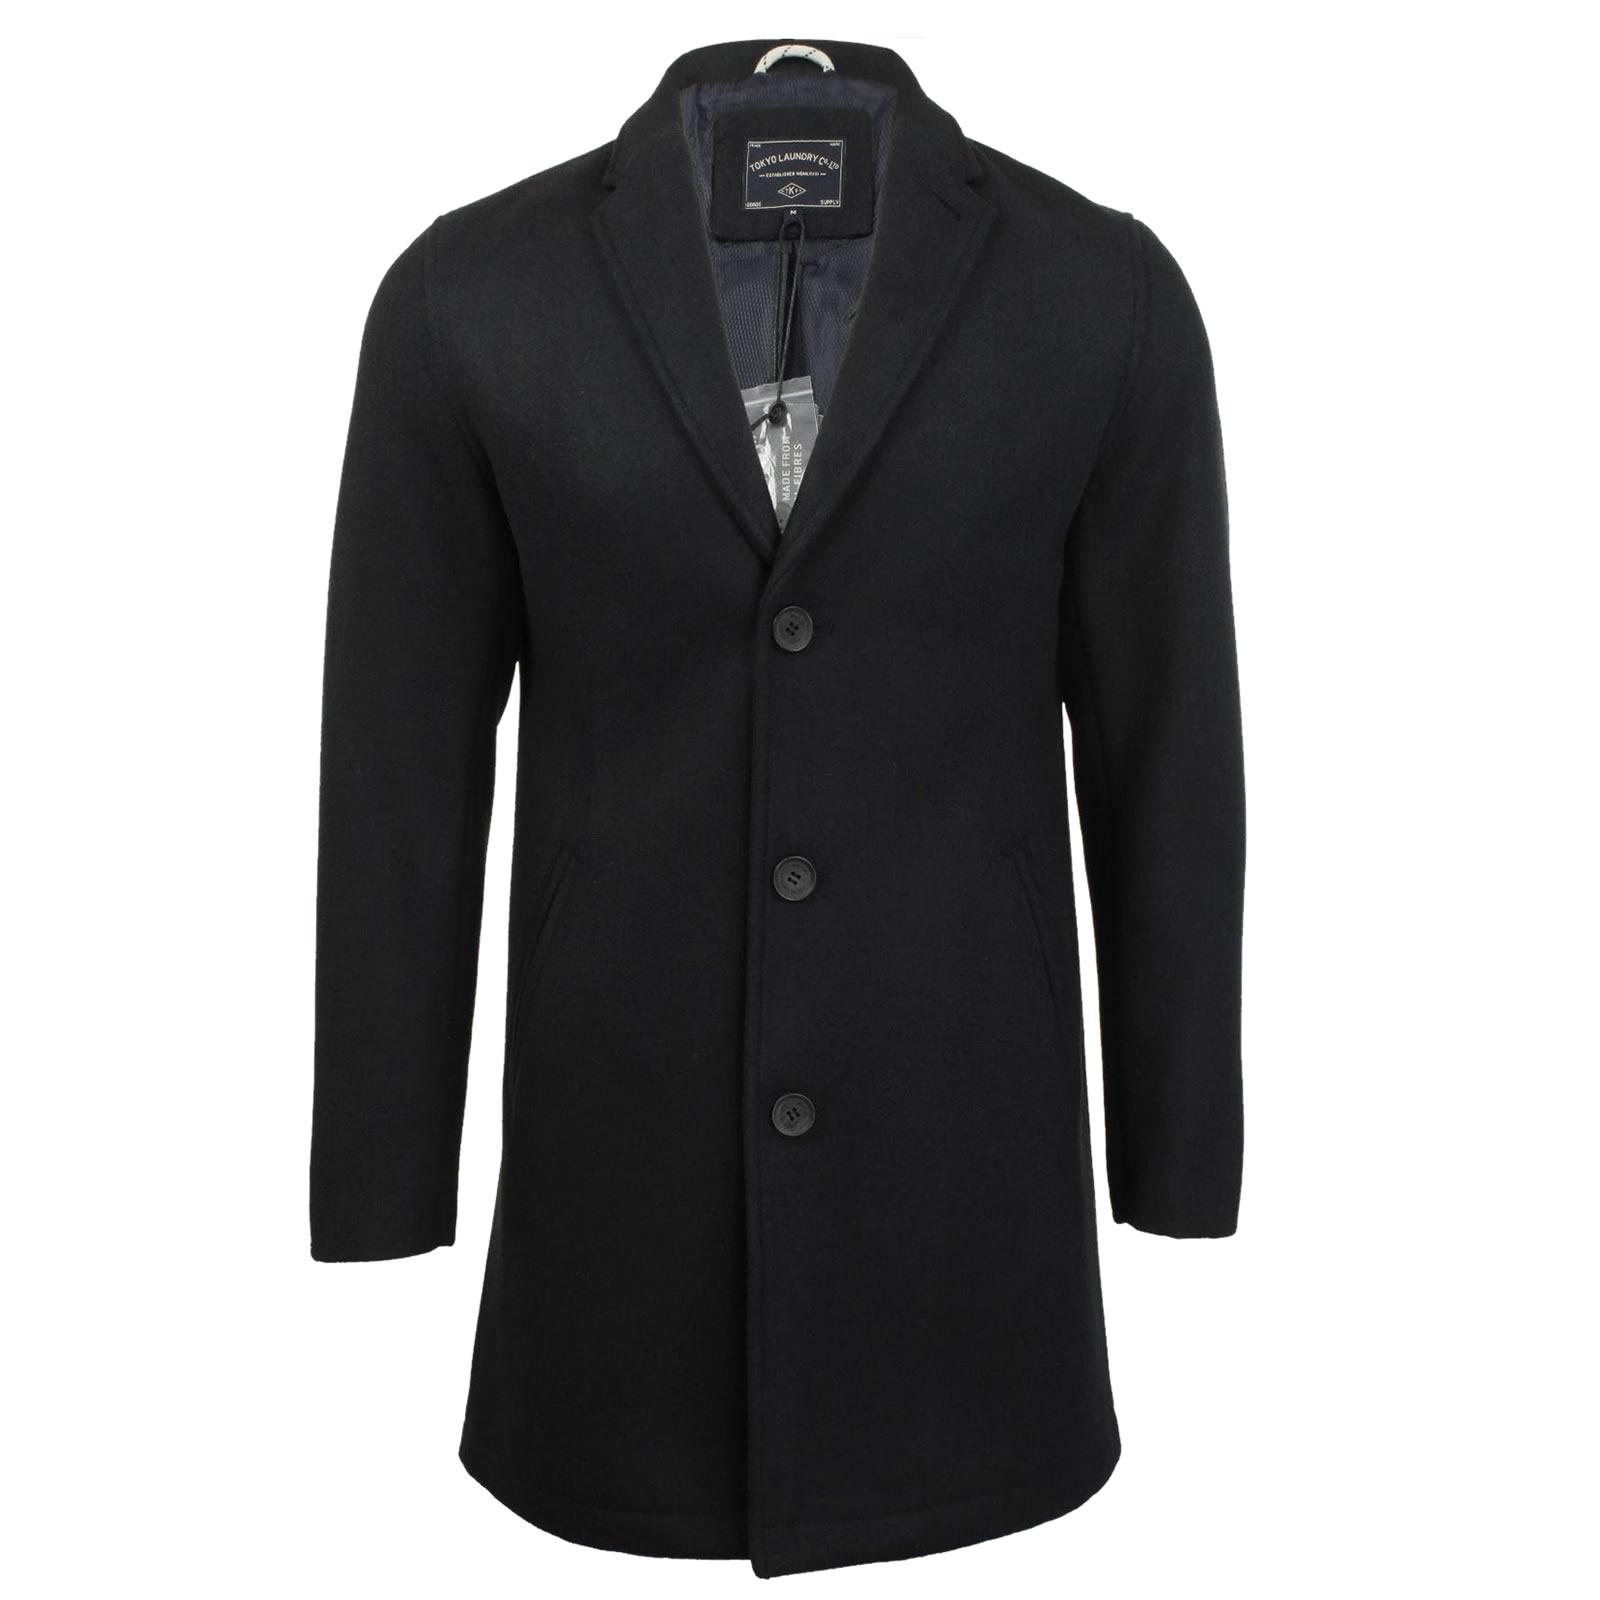 Mens Overcoat Jacket Tokyo Laundry Bezout Long Wool Mix Coat | eBay